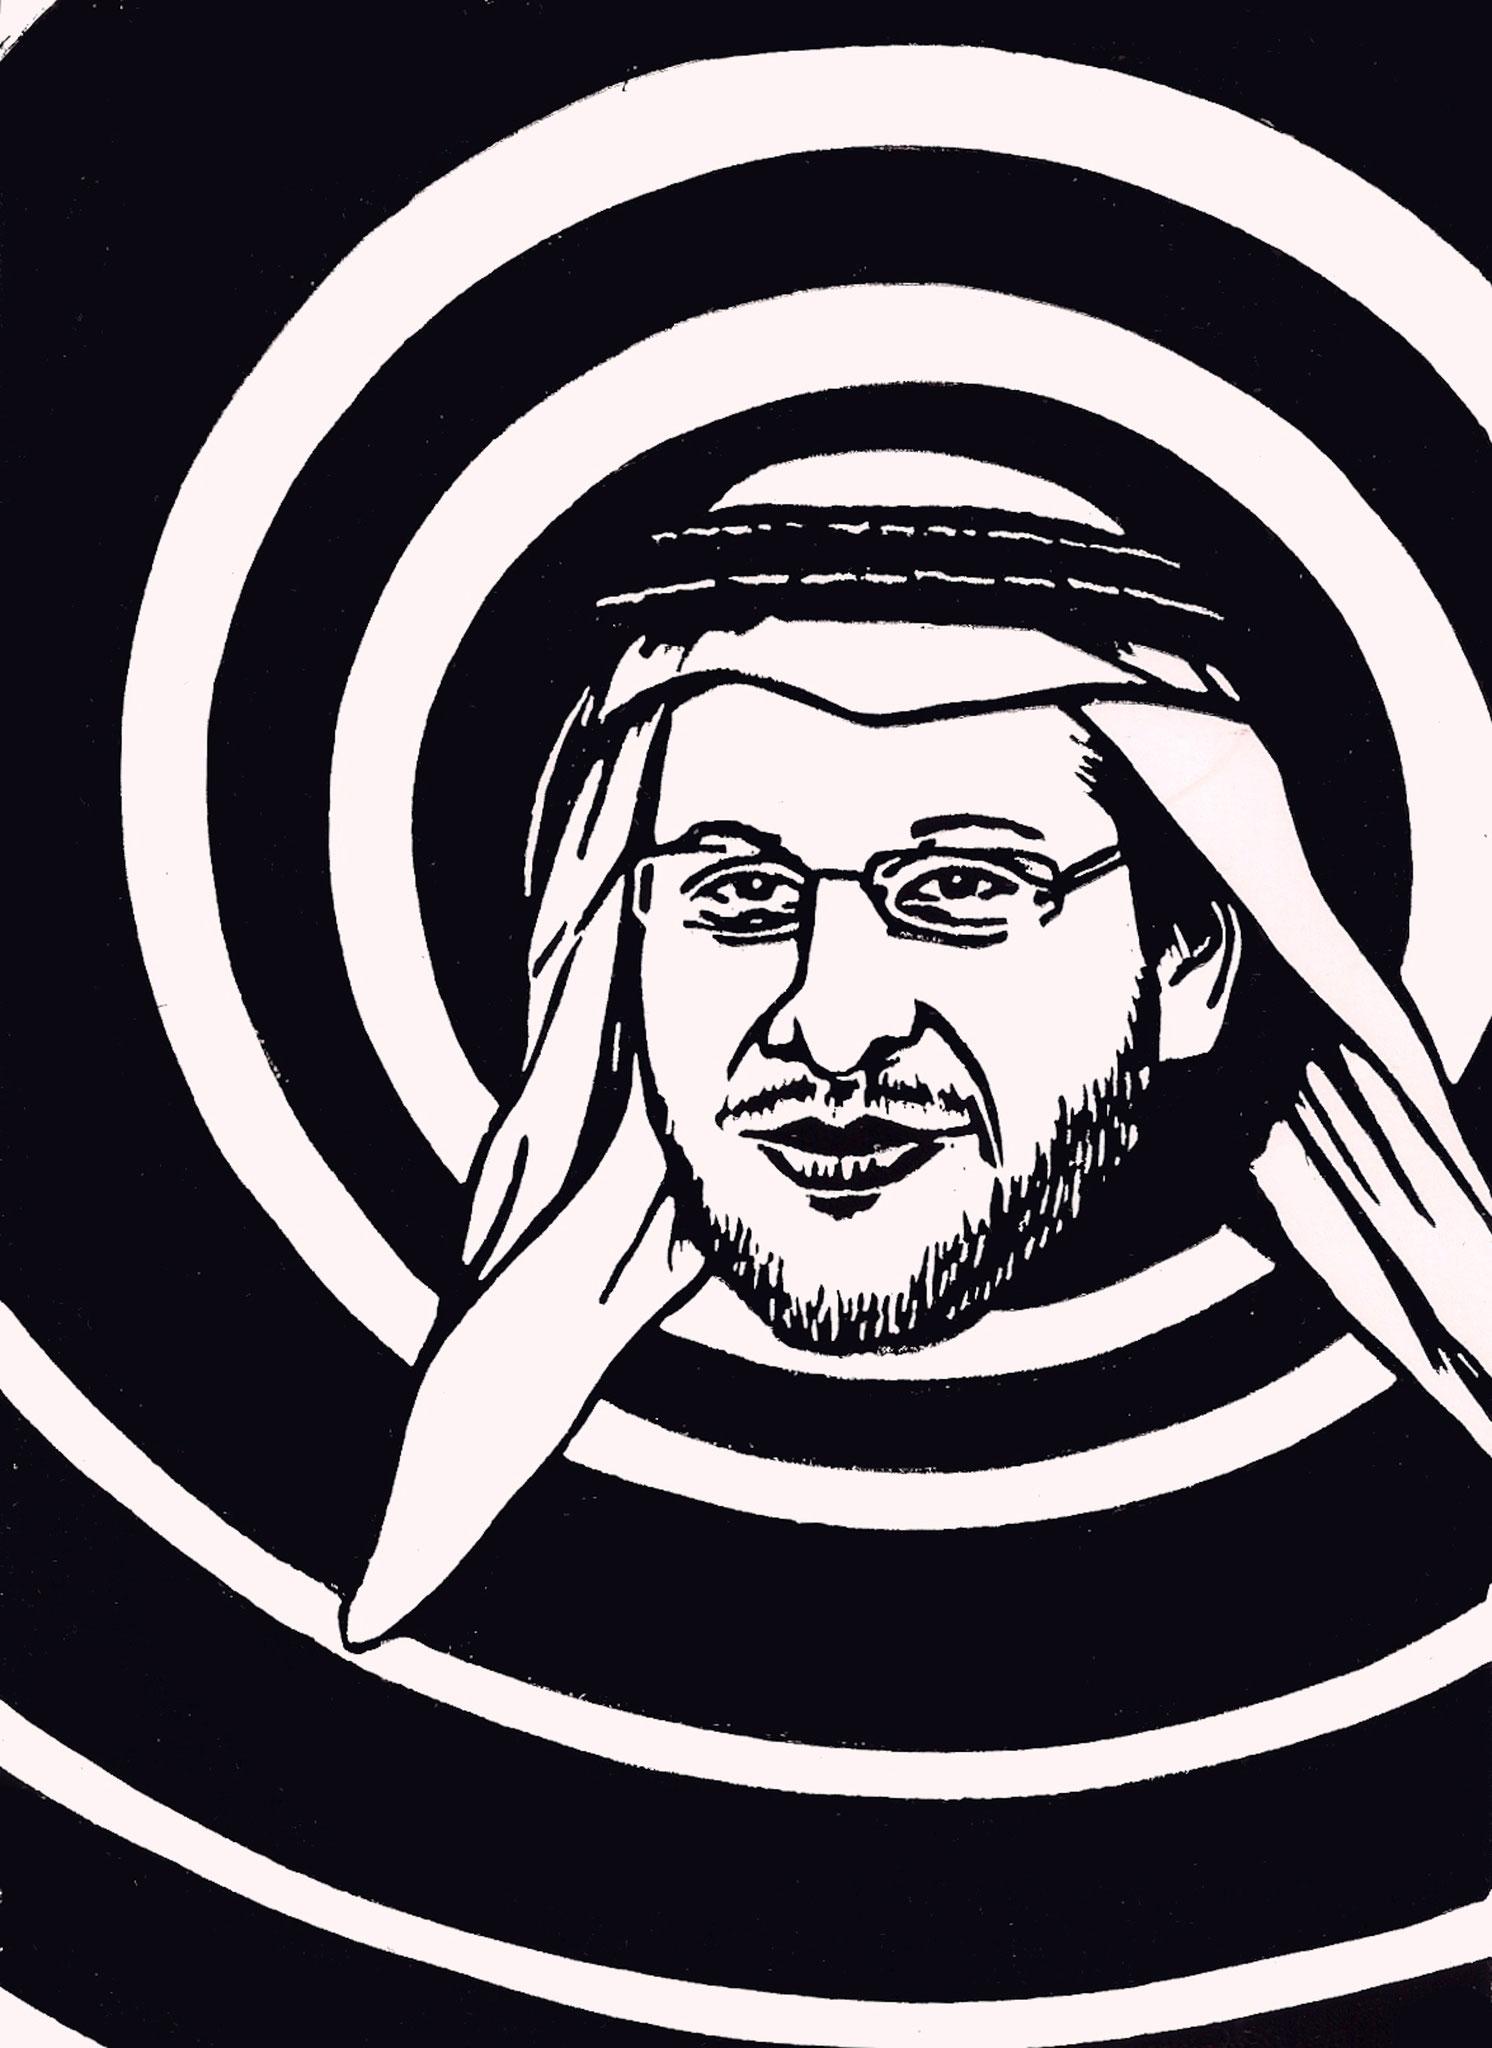 Abu Al-Khair, 03/02/2018, Edition 5, A5